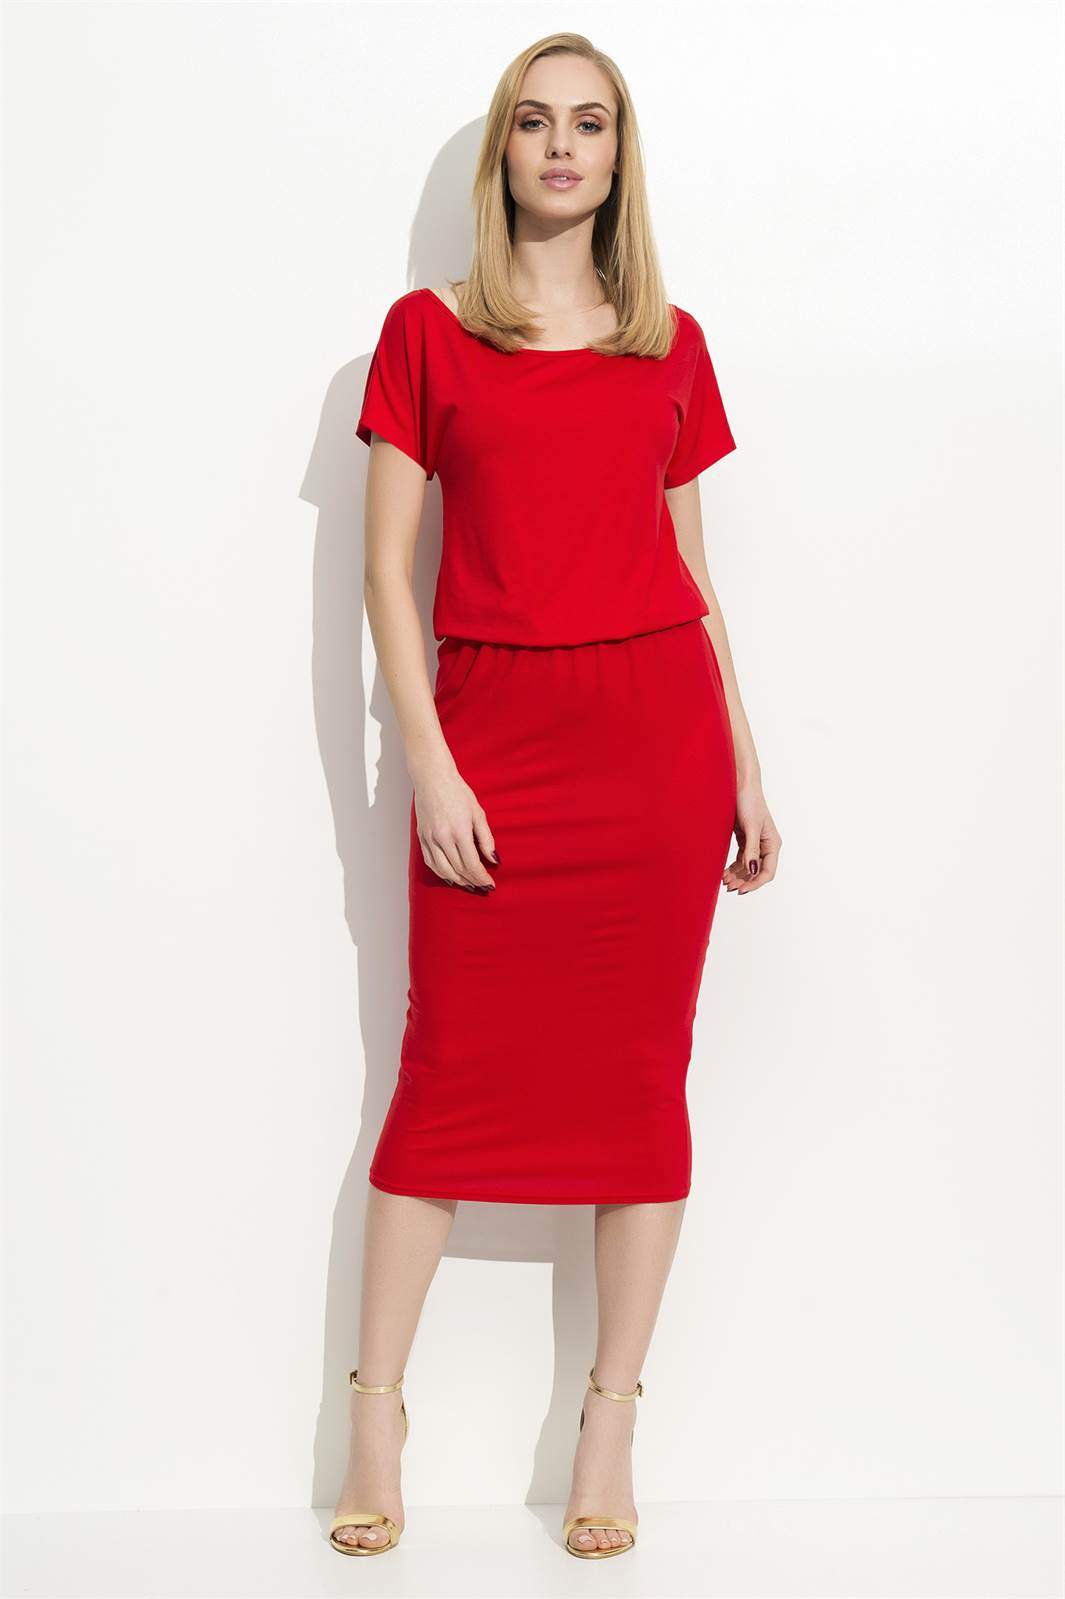 Šaty Folly F05 červené  8c1936d5bc